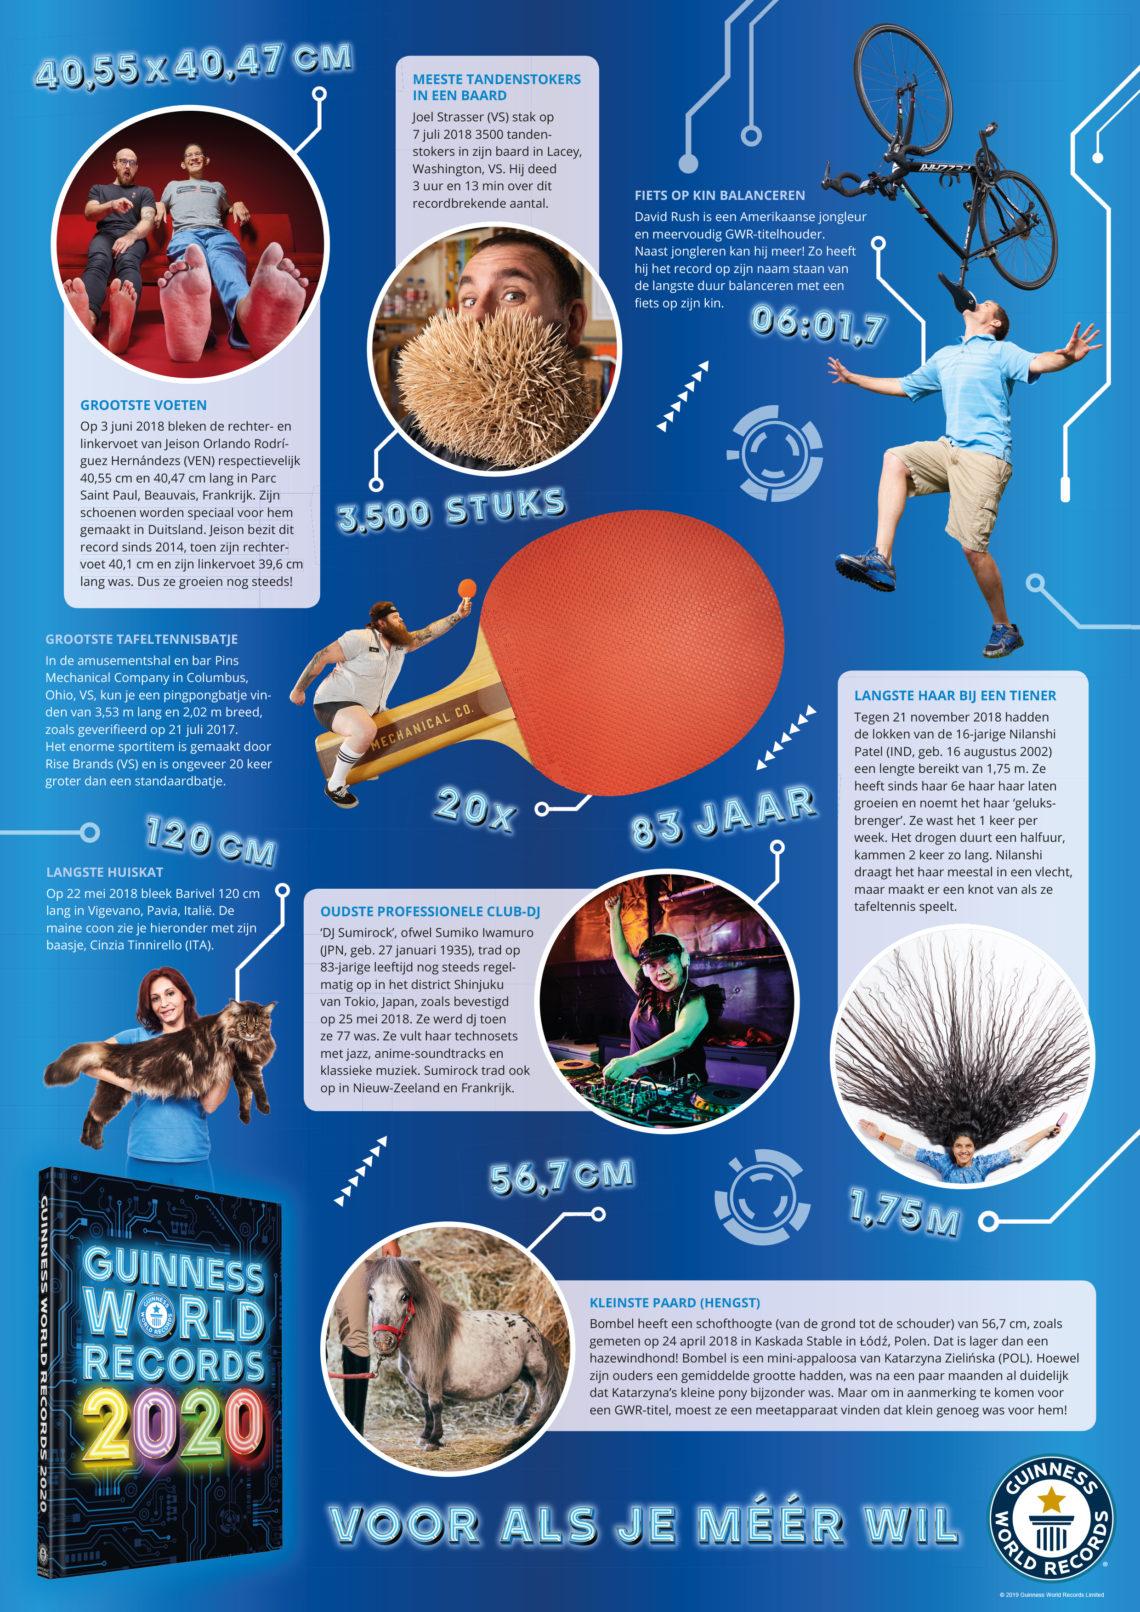 Guinness World Records 2020 poster